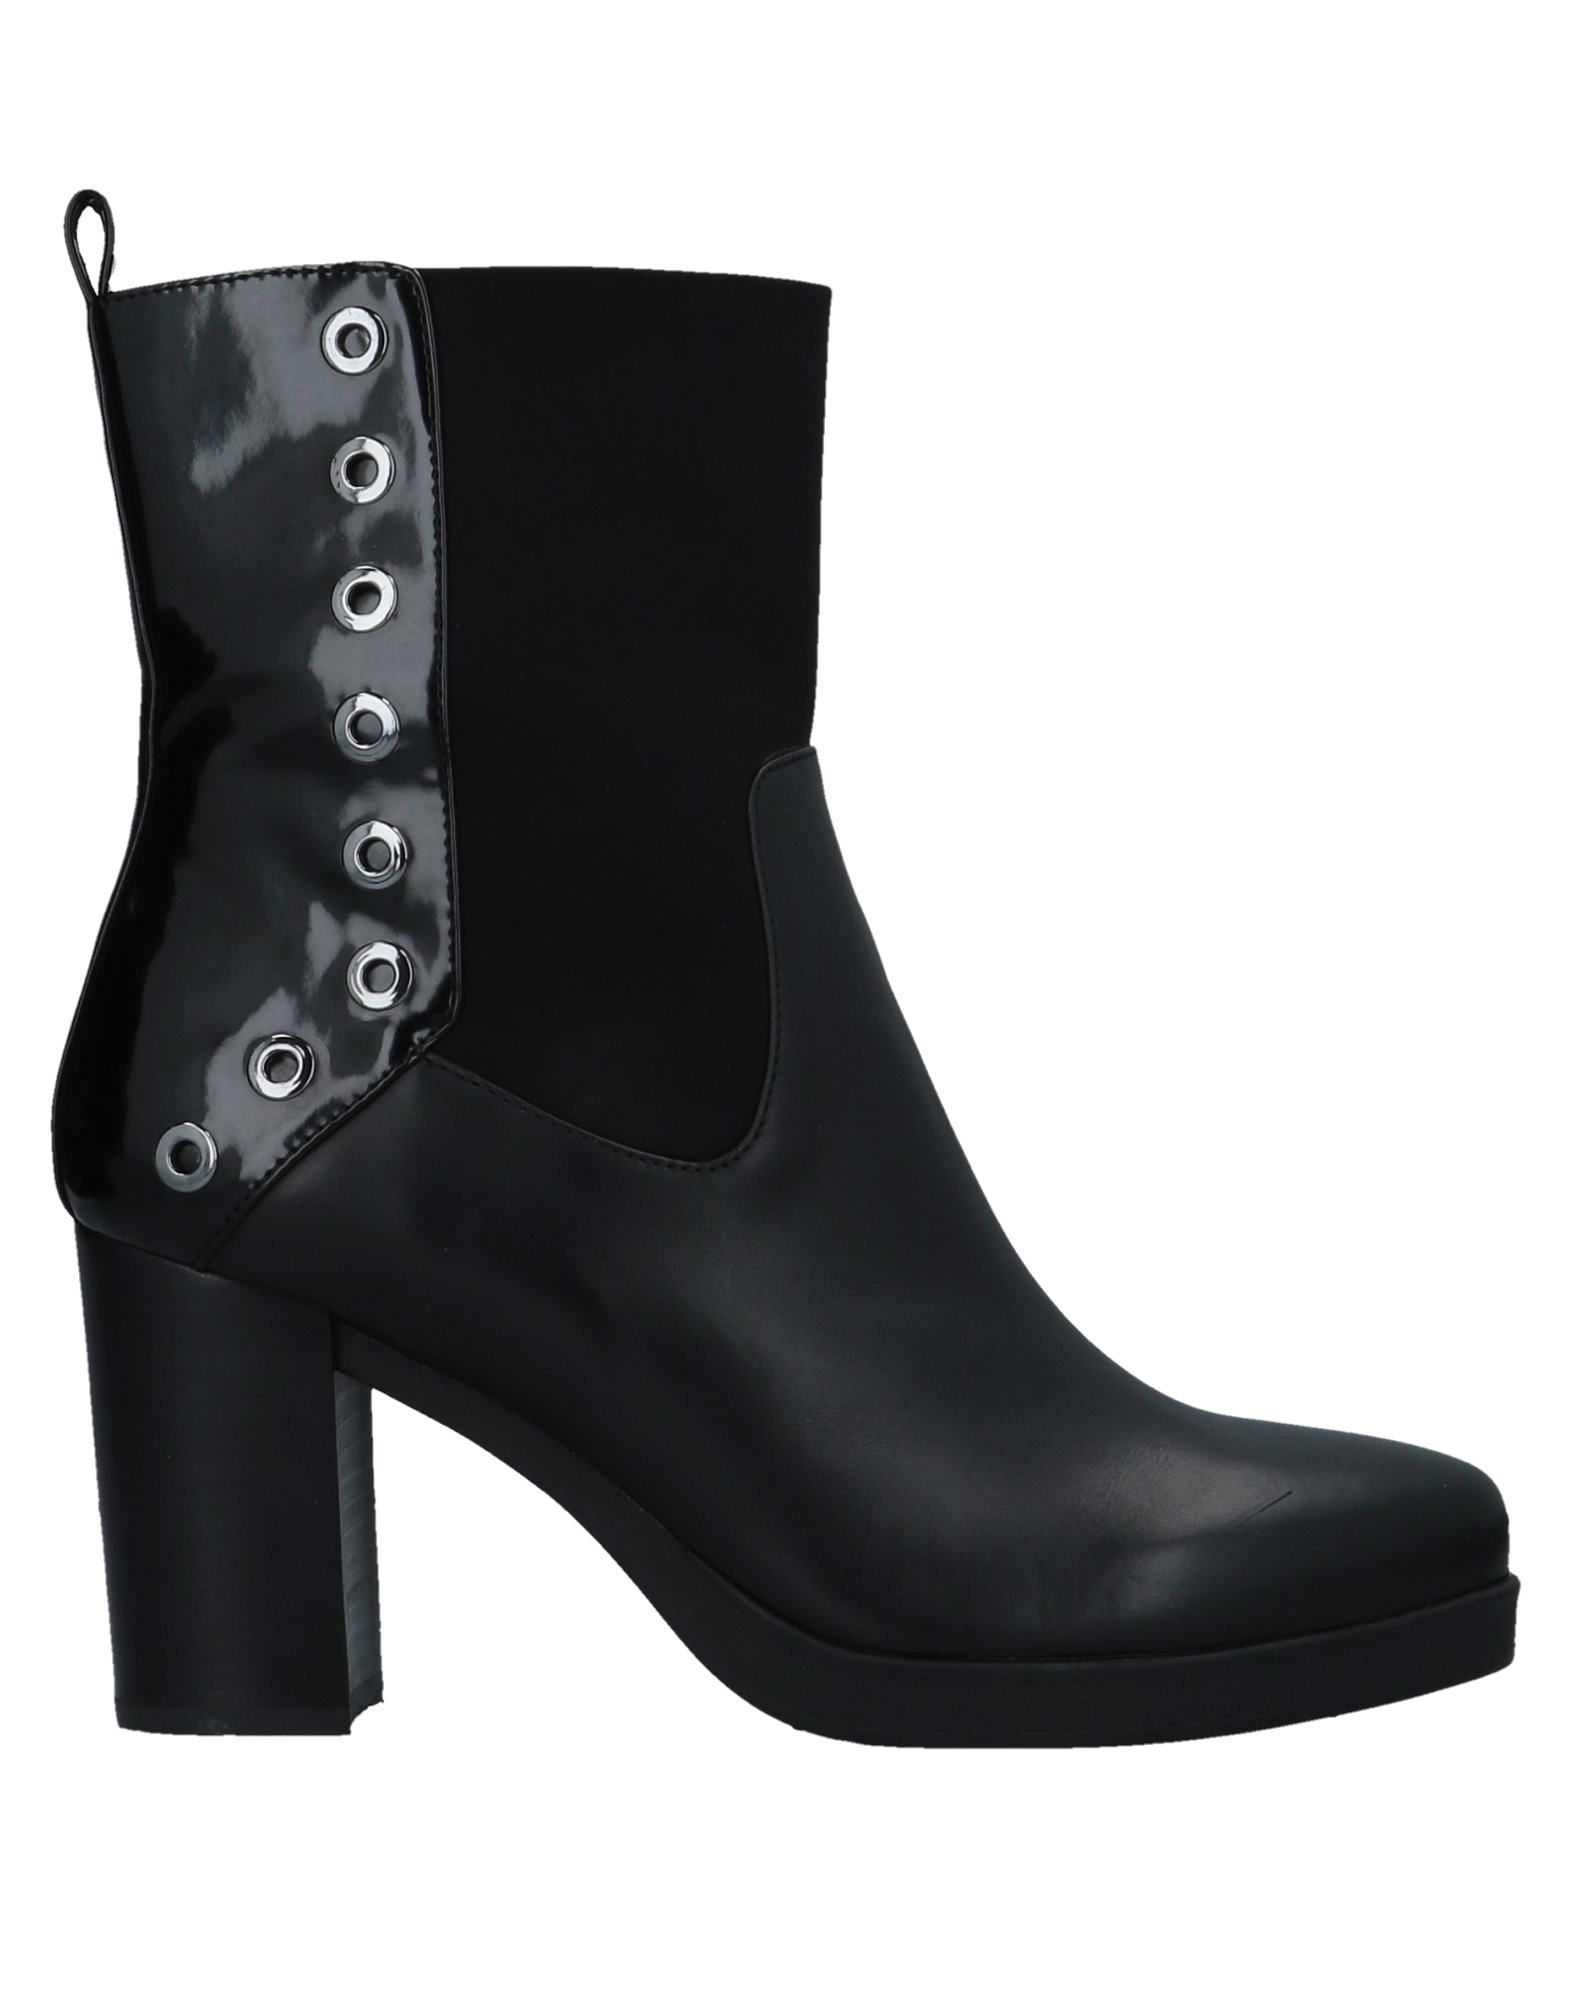 Luciano Barachini Stiefelette Damen  11538168VT Gute Qualität beliebte Schuhe